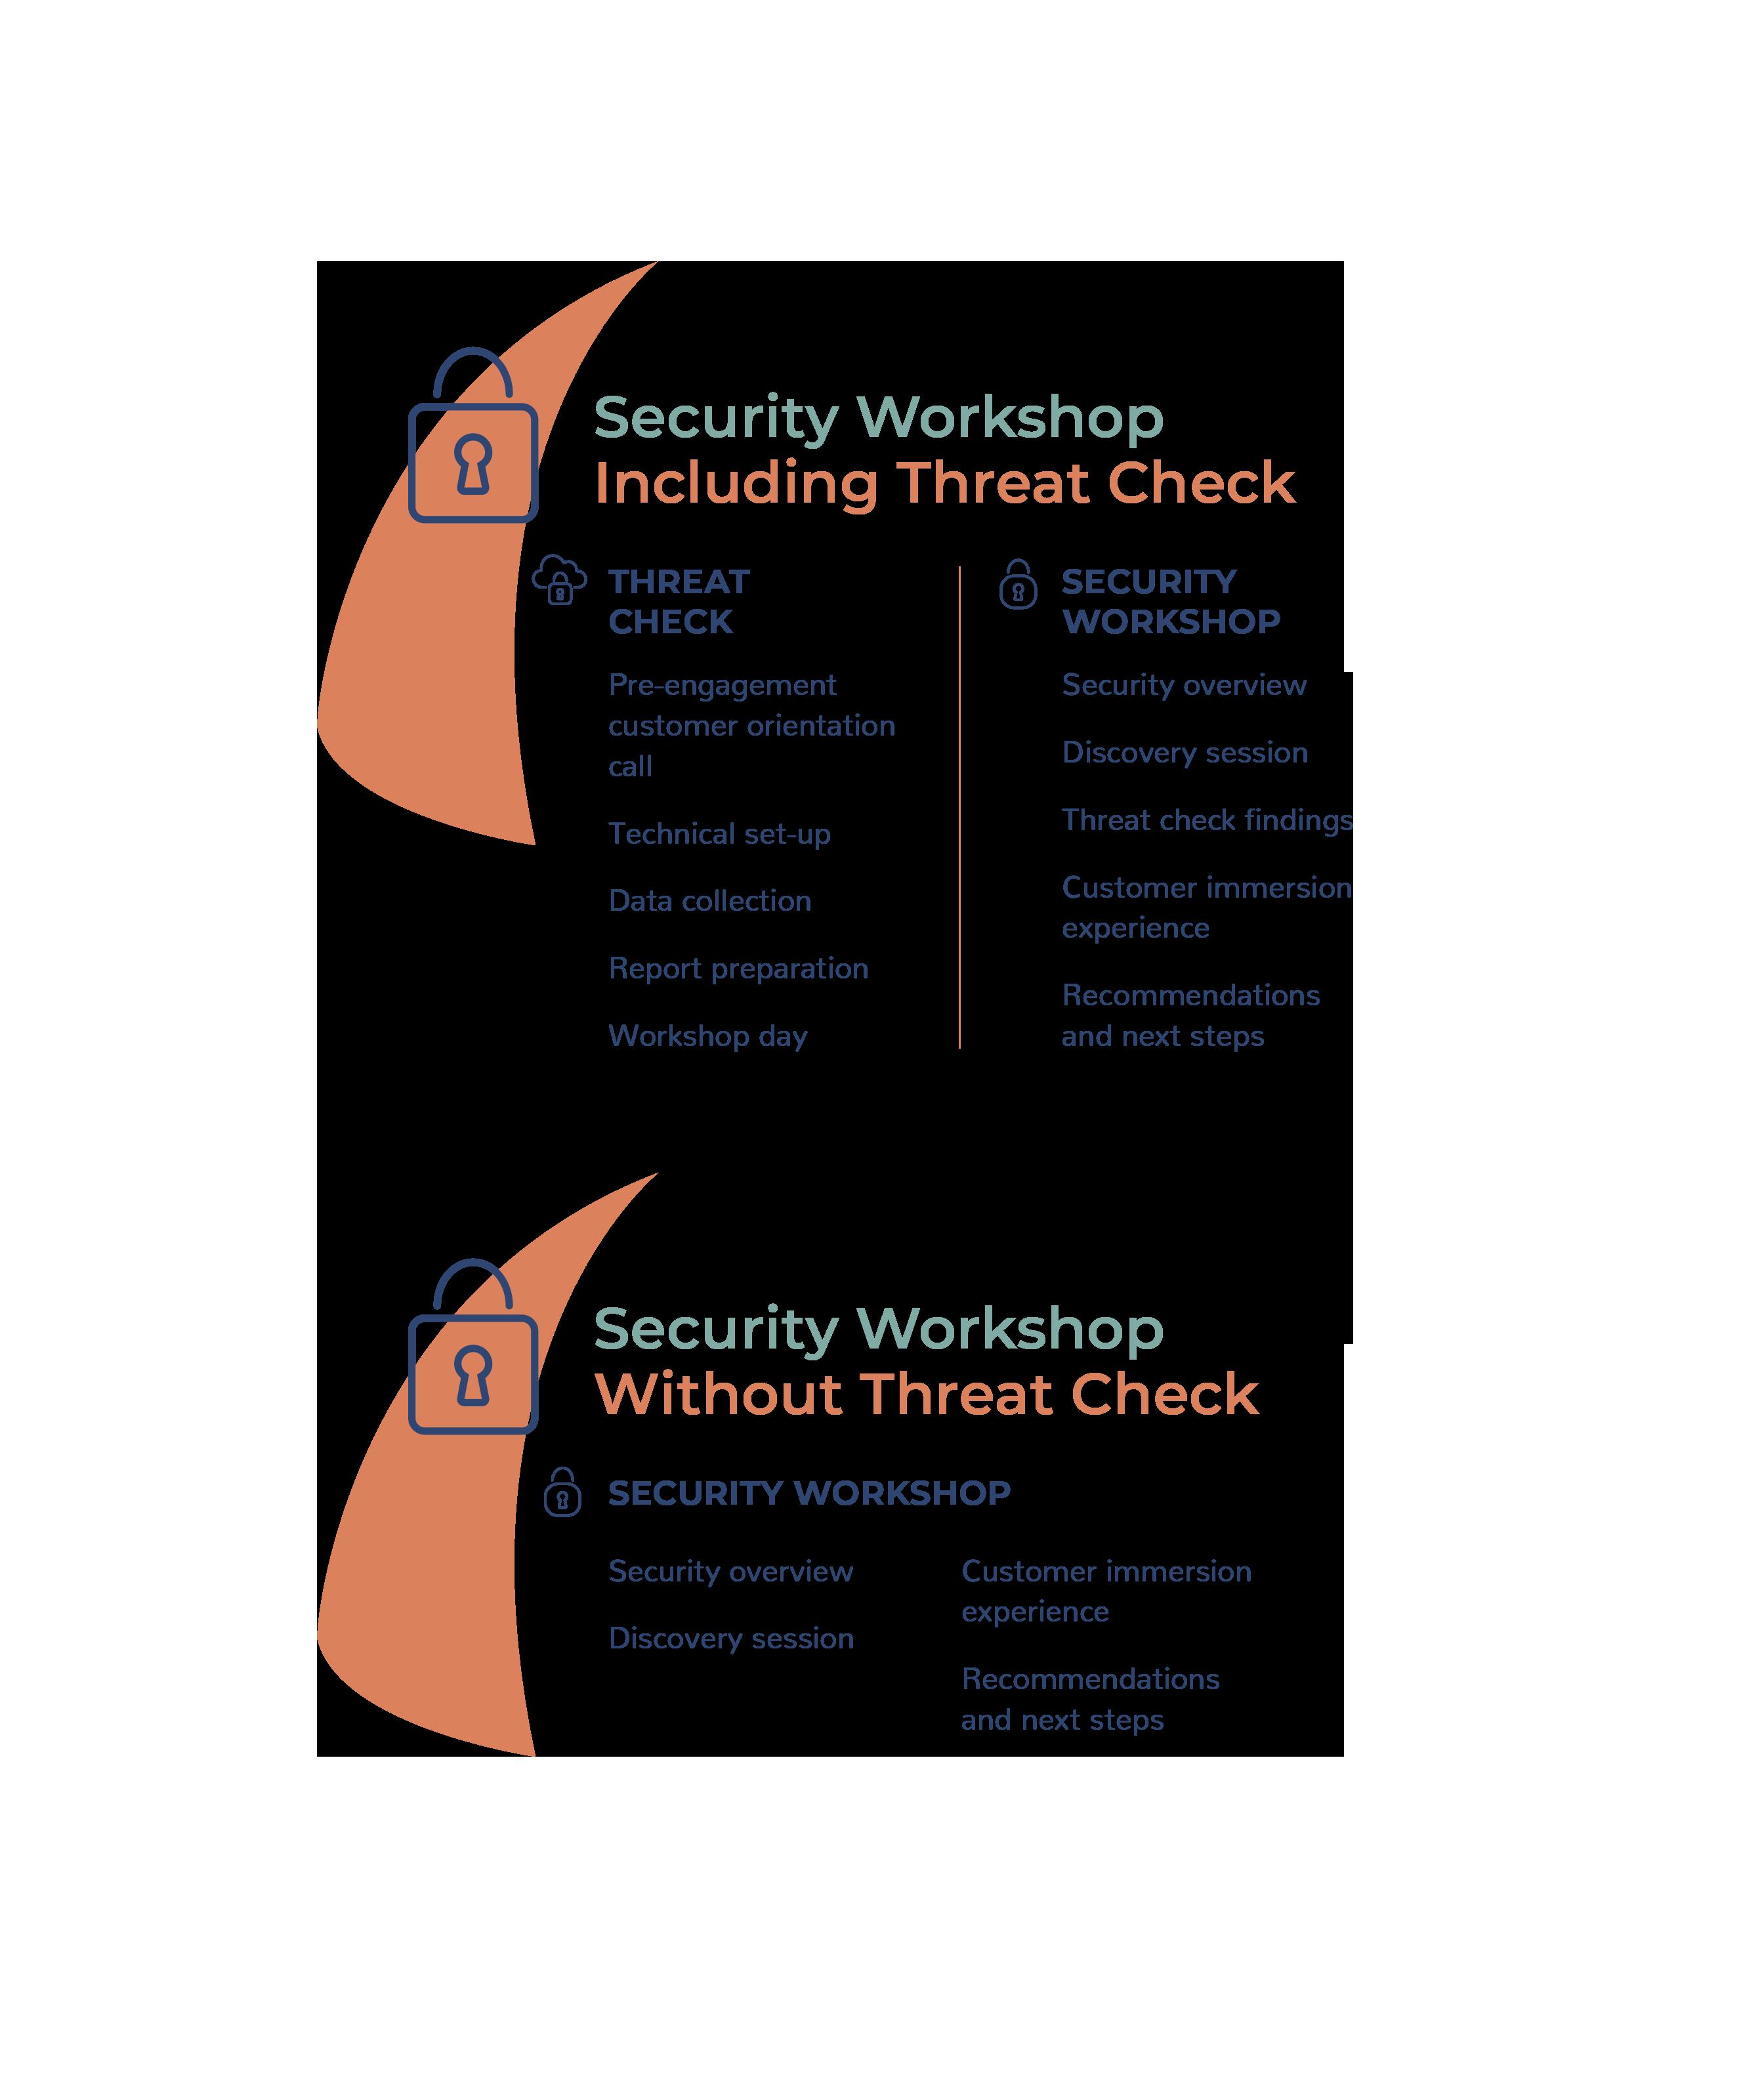 104426_Core_Tech_Security_Workshop_Graphic_V1